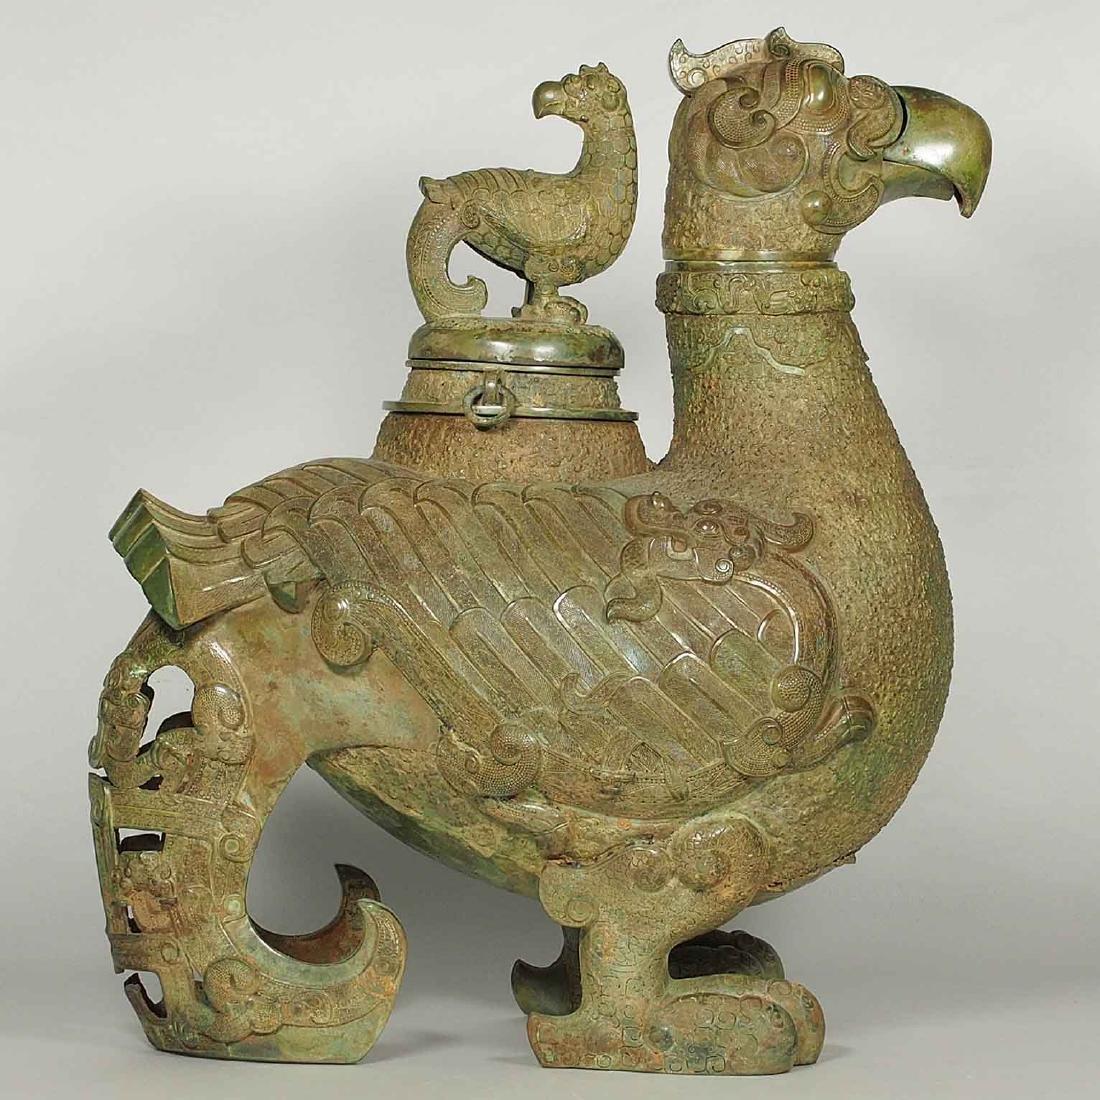 Bronze Garuda 'Zun' with Serpent Wing, Spring Autumn